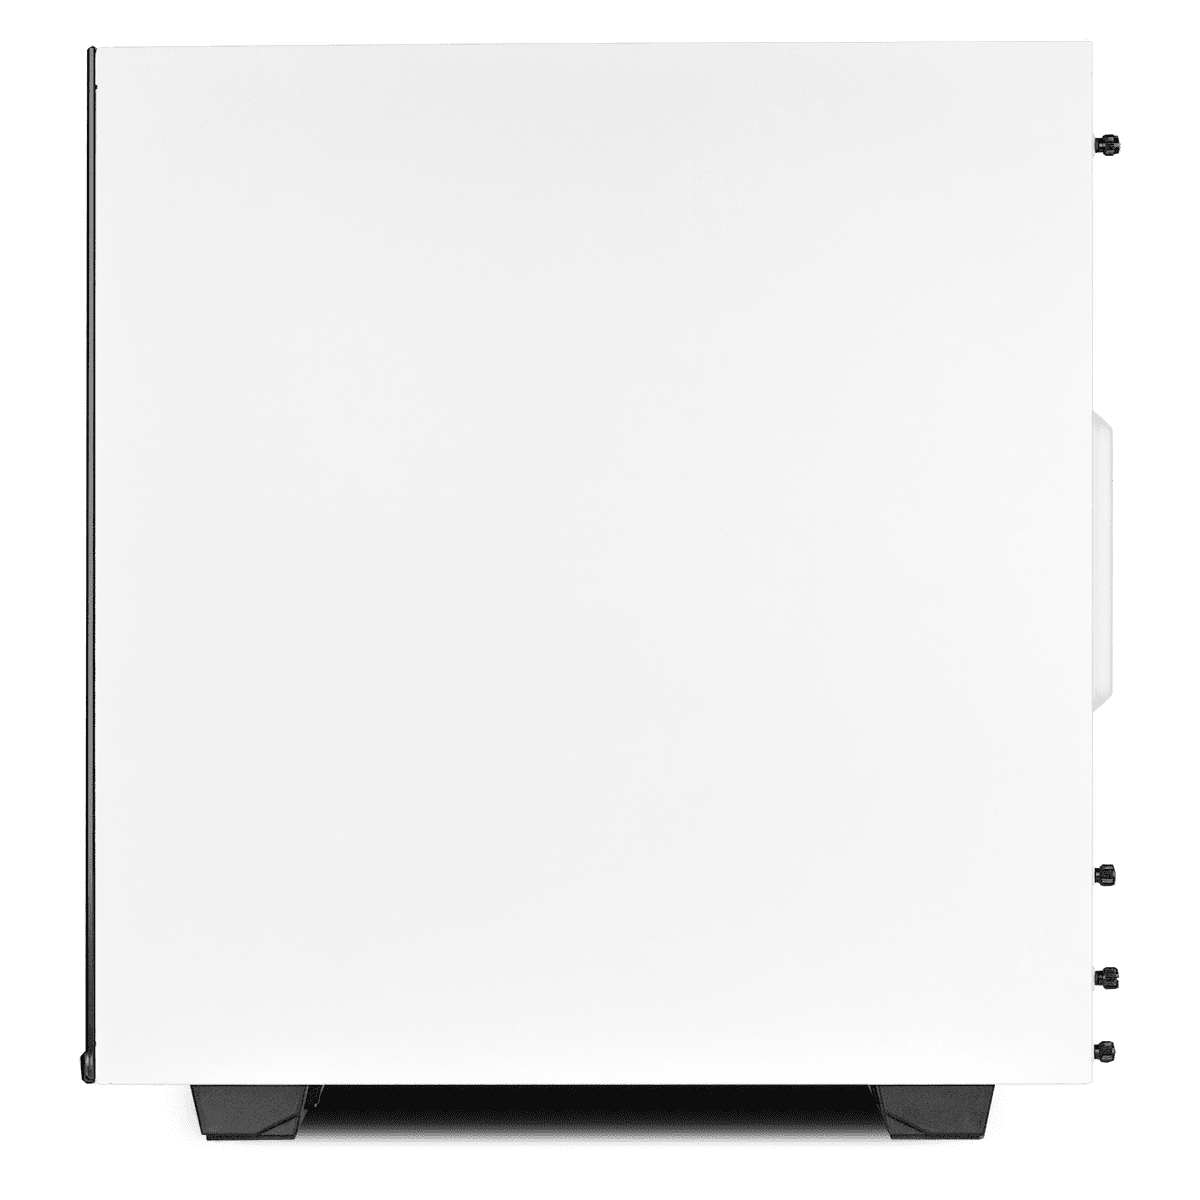 04-snowblind-element-case-nonside-1200